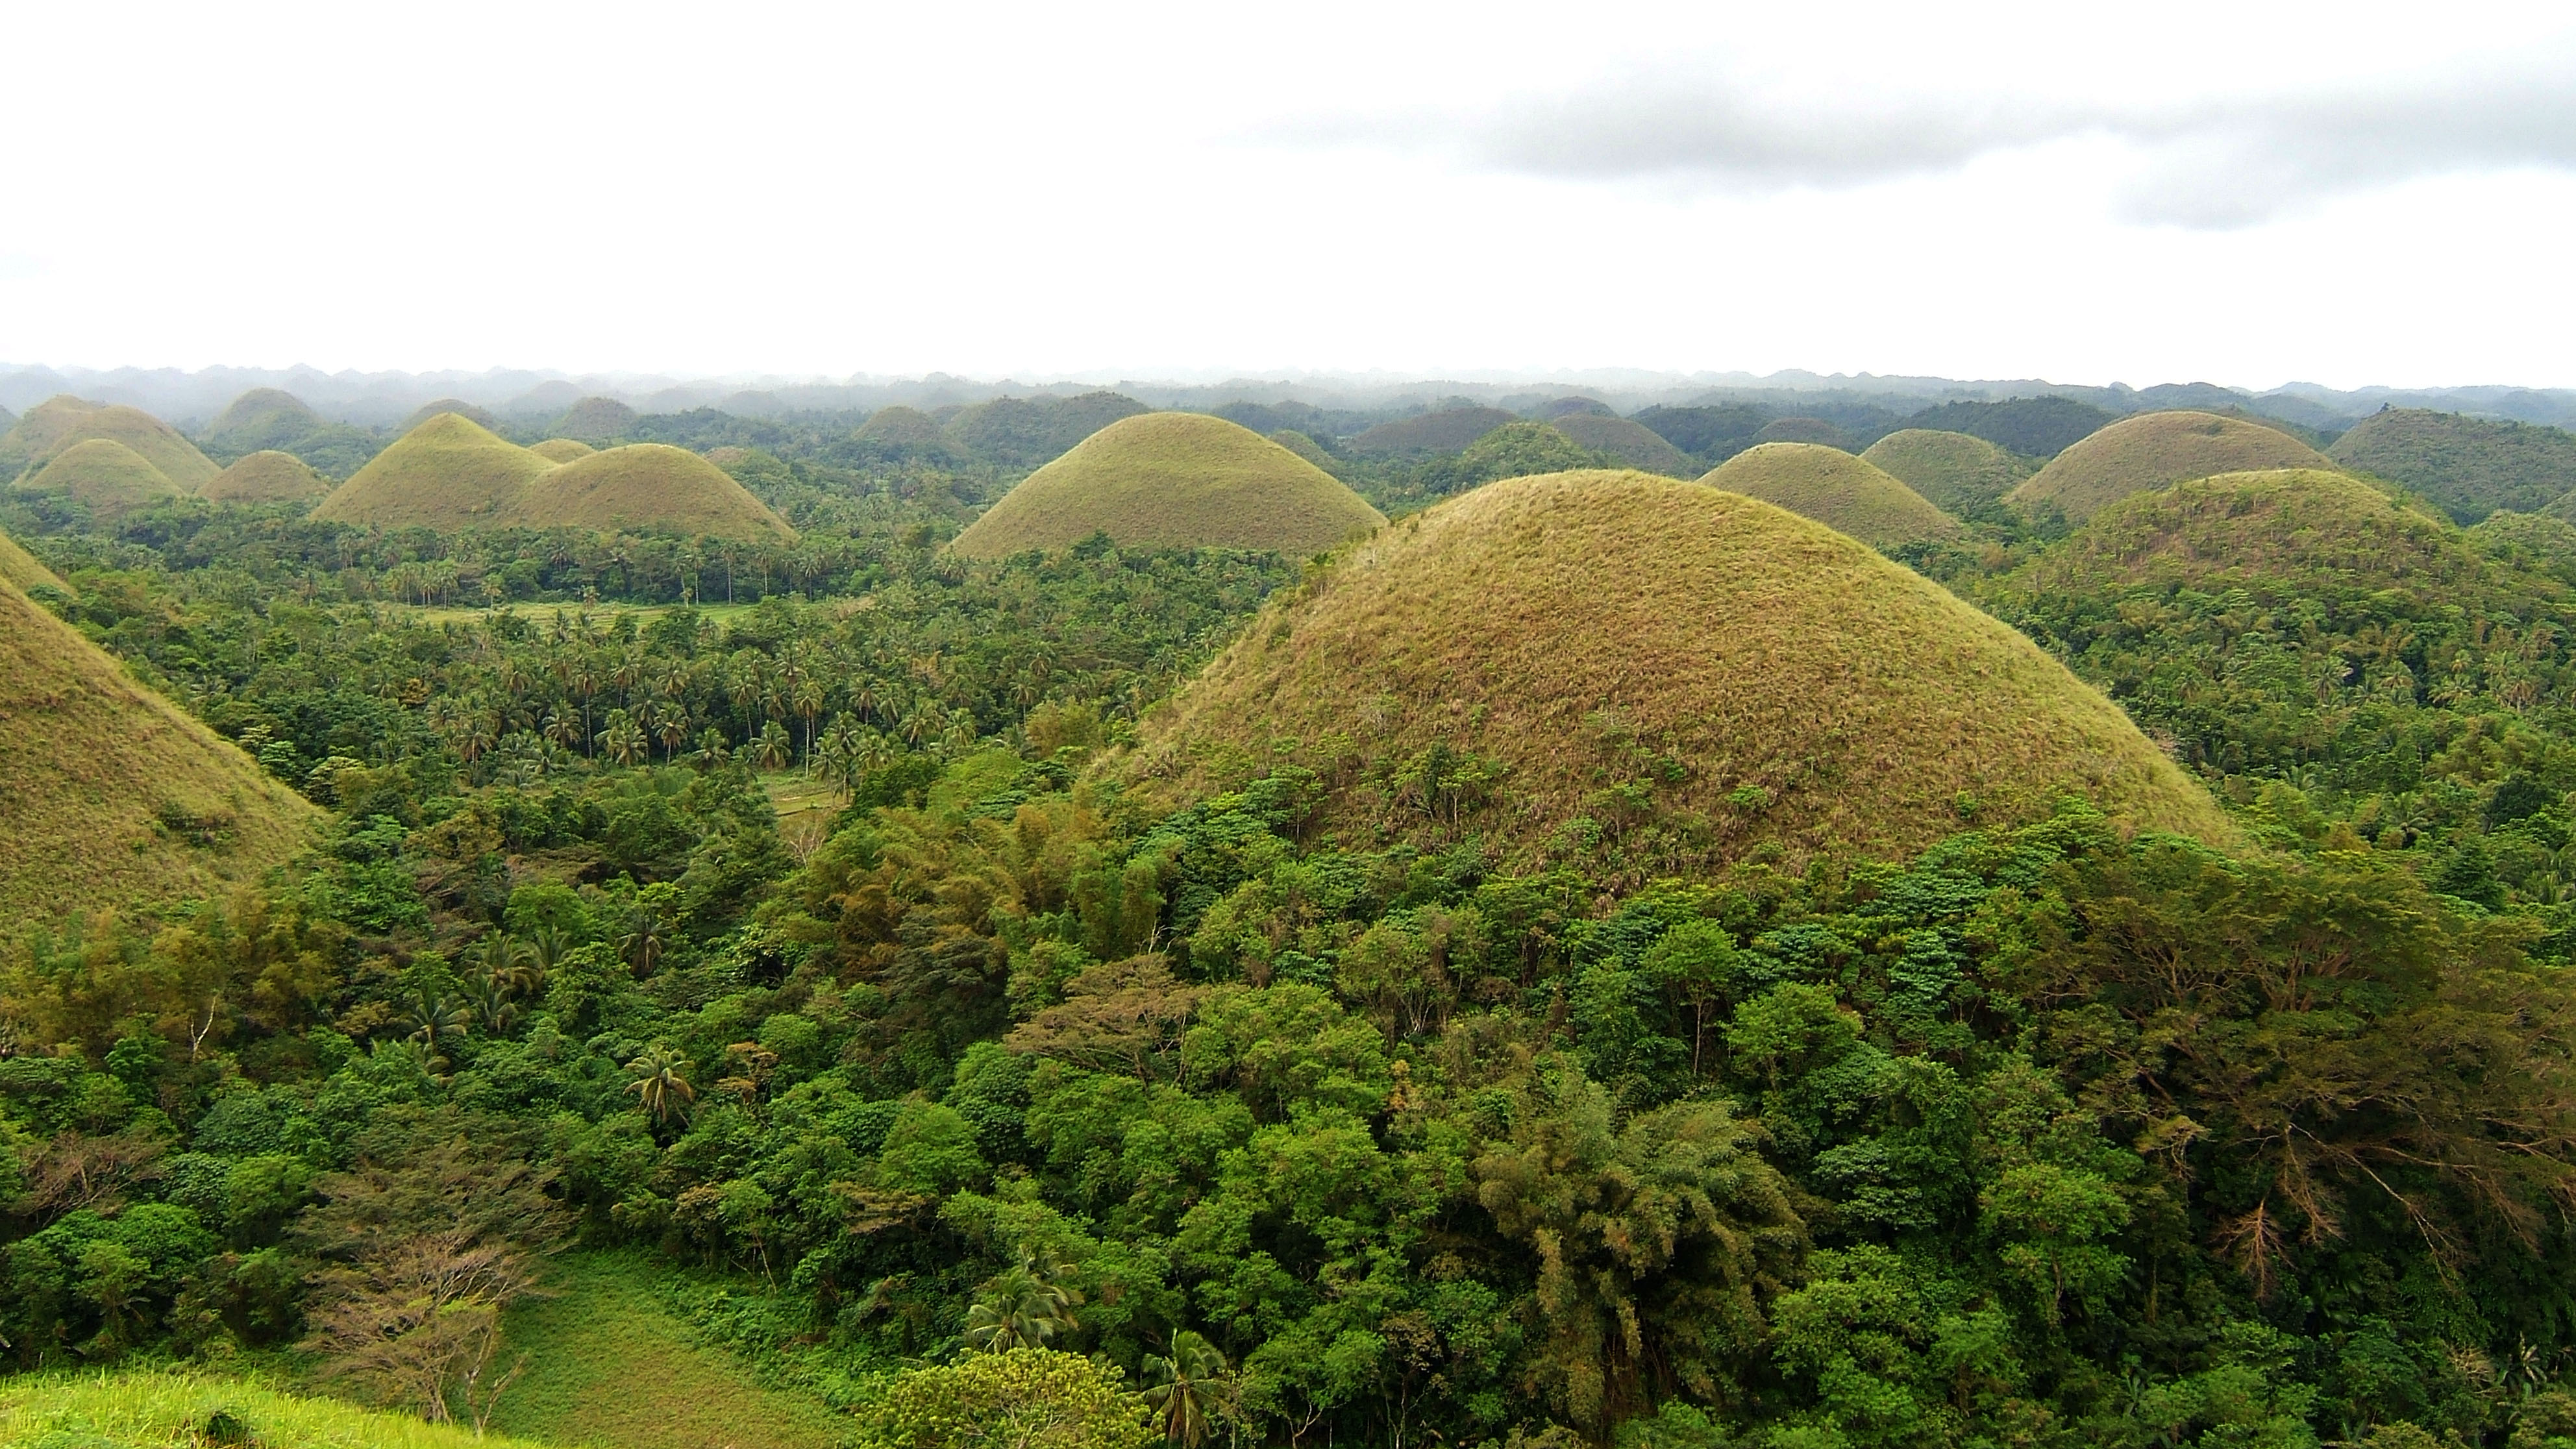 Philippines Sagbayan Batuan Carmen Bohol Chocolate Hills Dec 2005 02